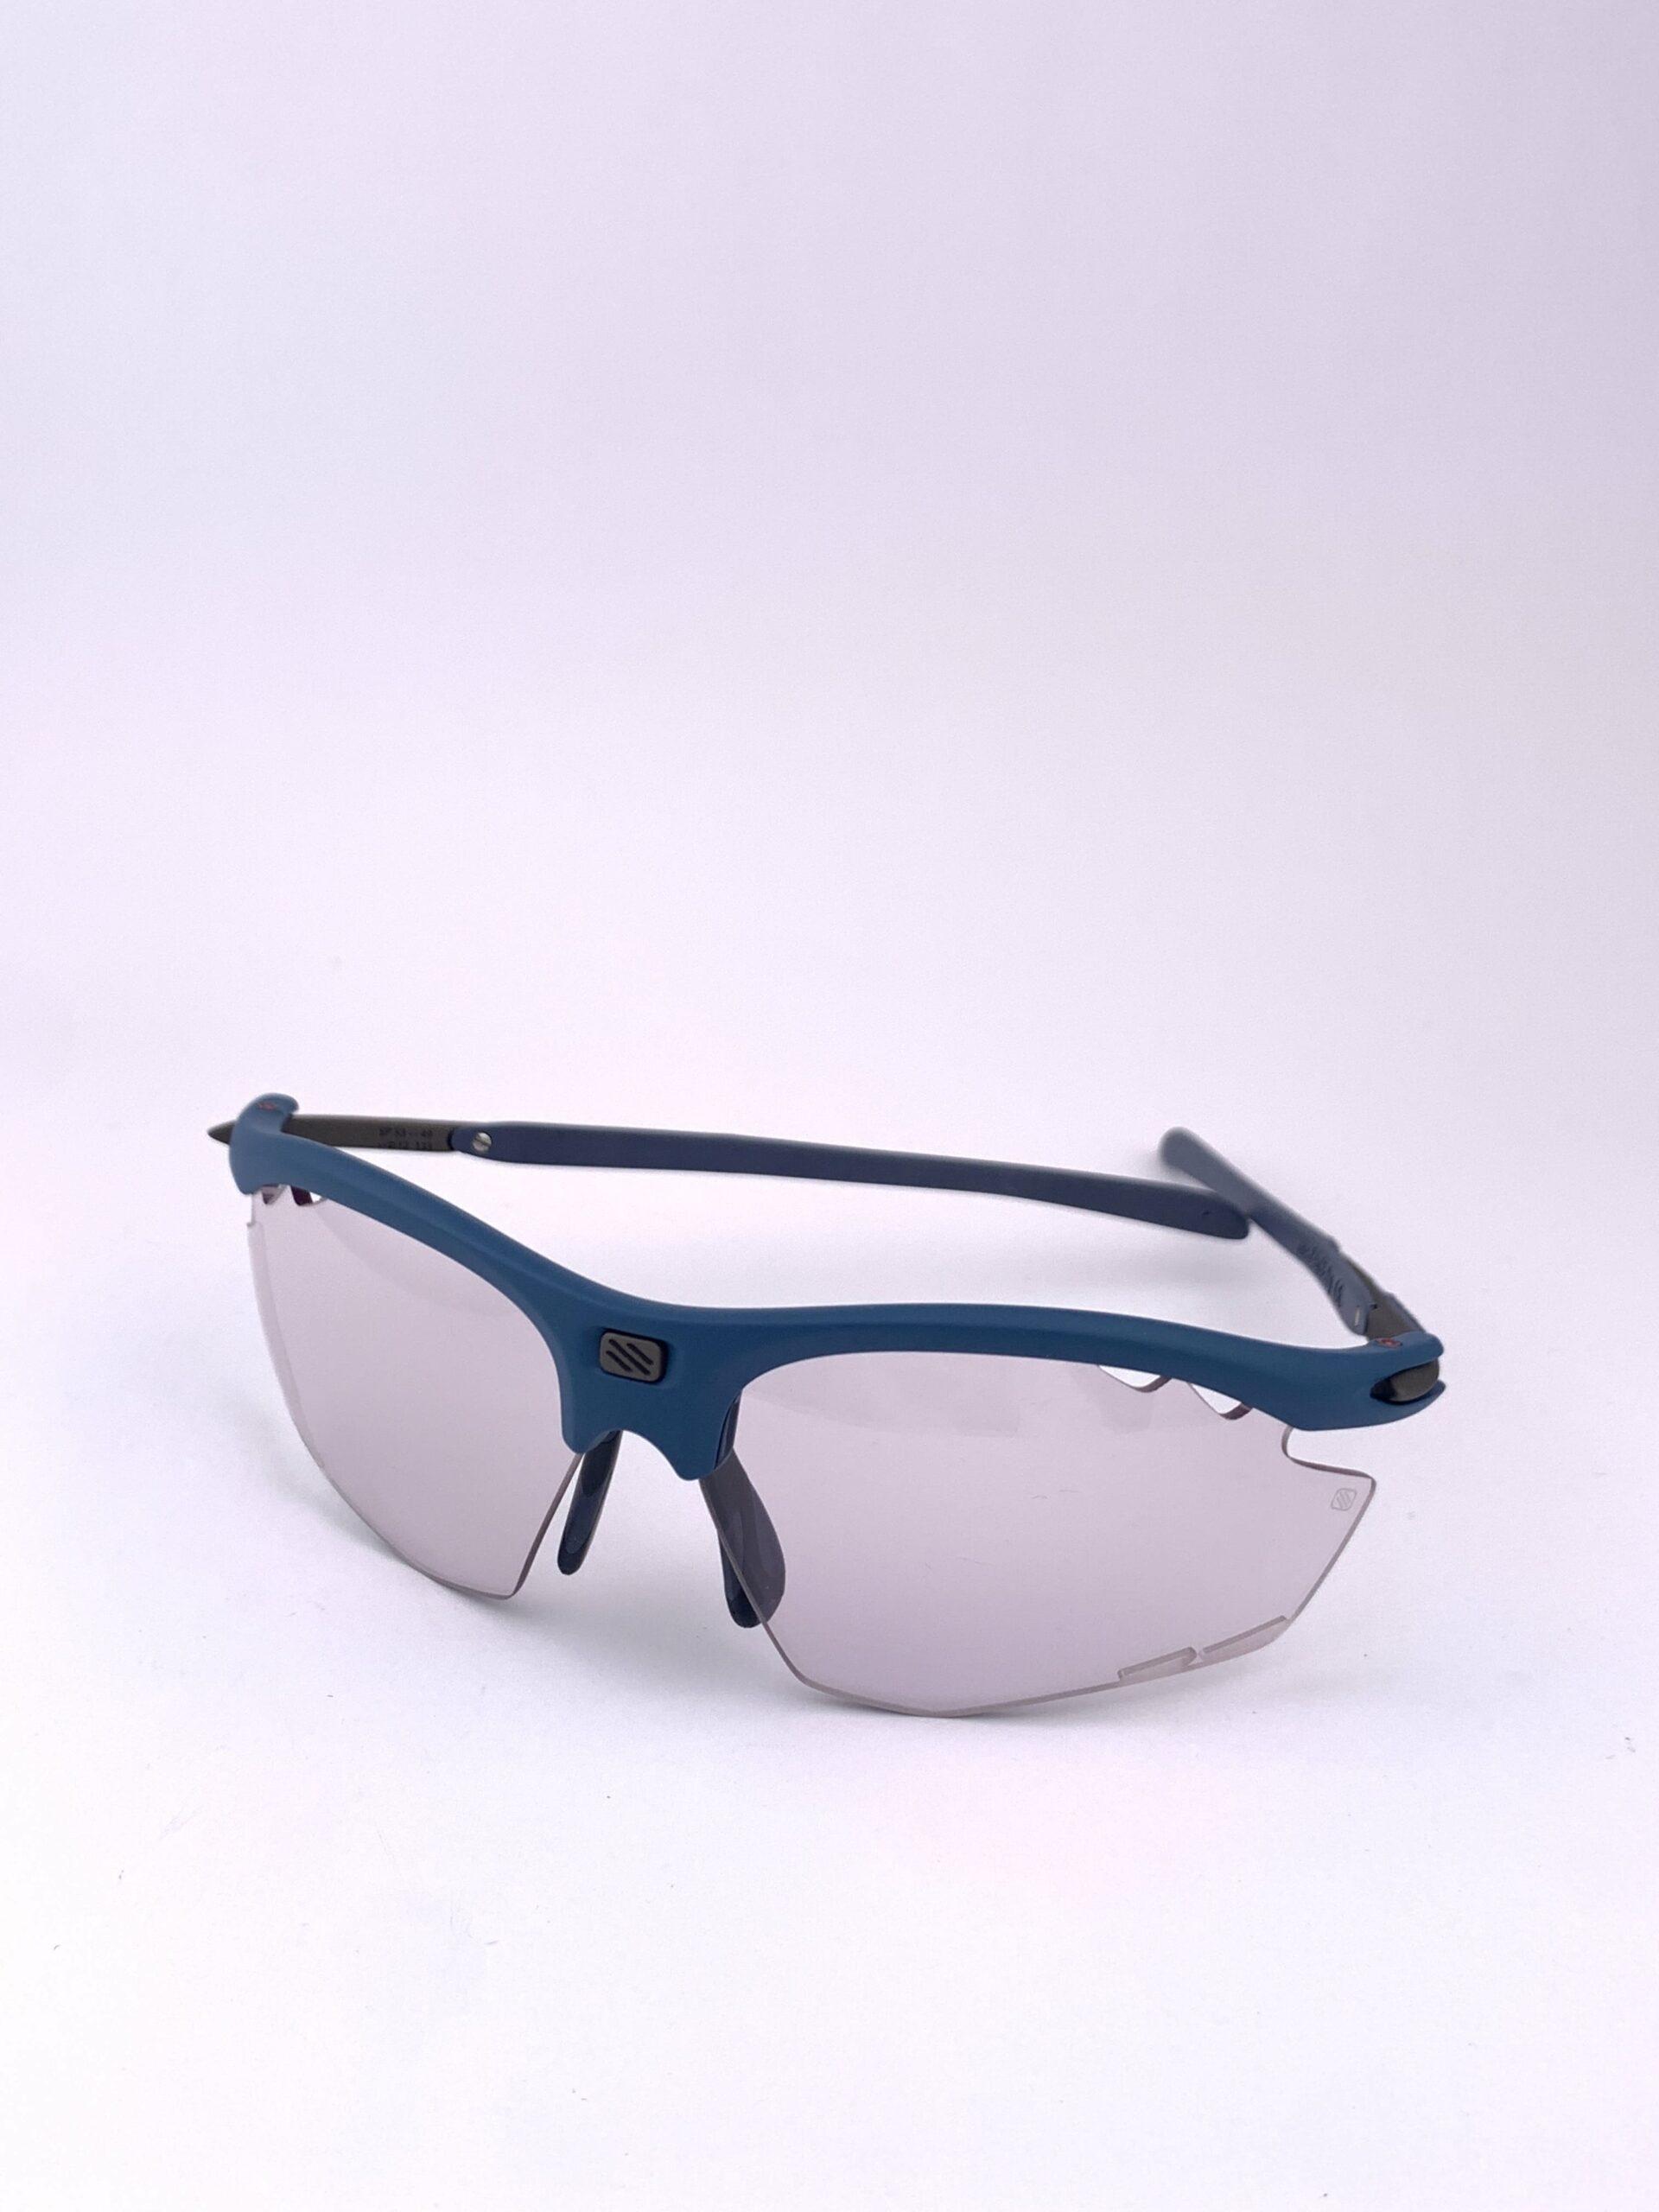 Cyklo okuliare Rydon modré zboku